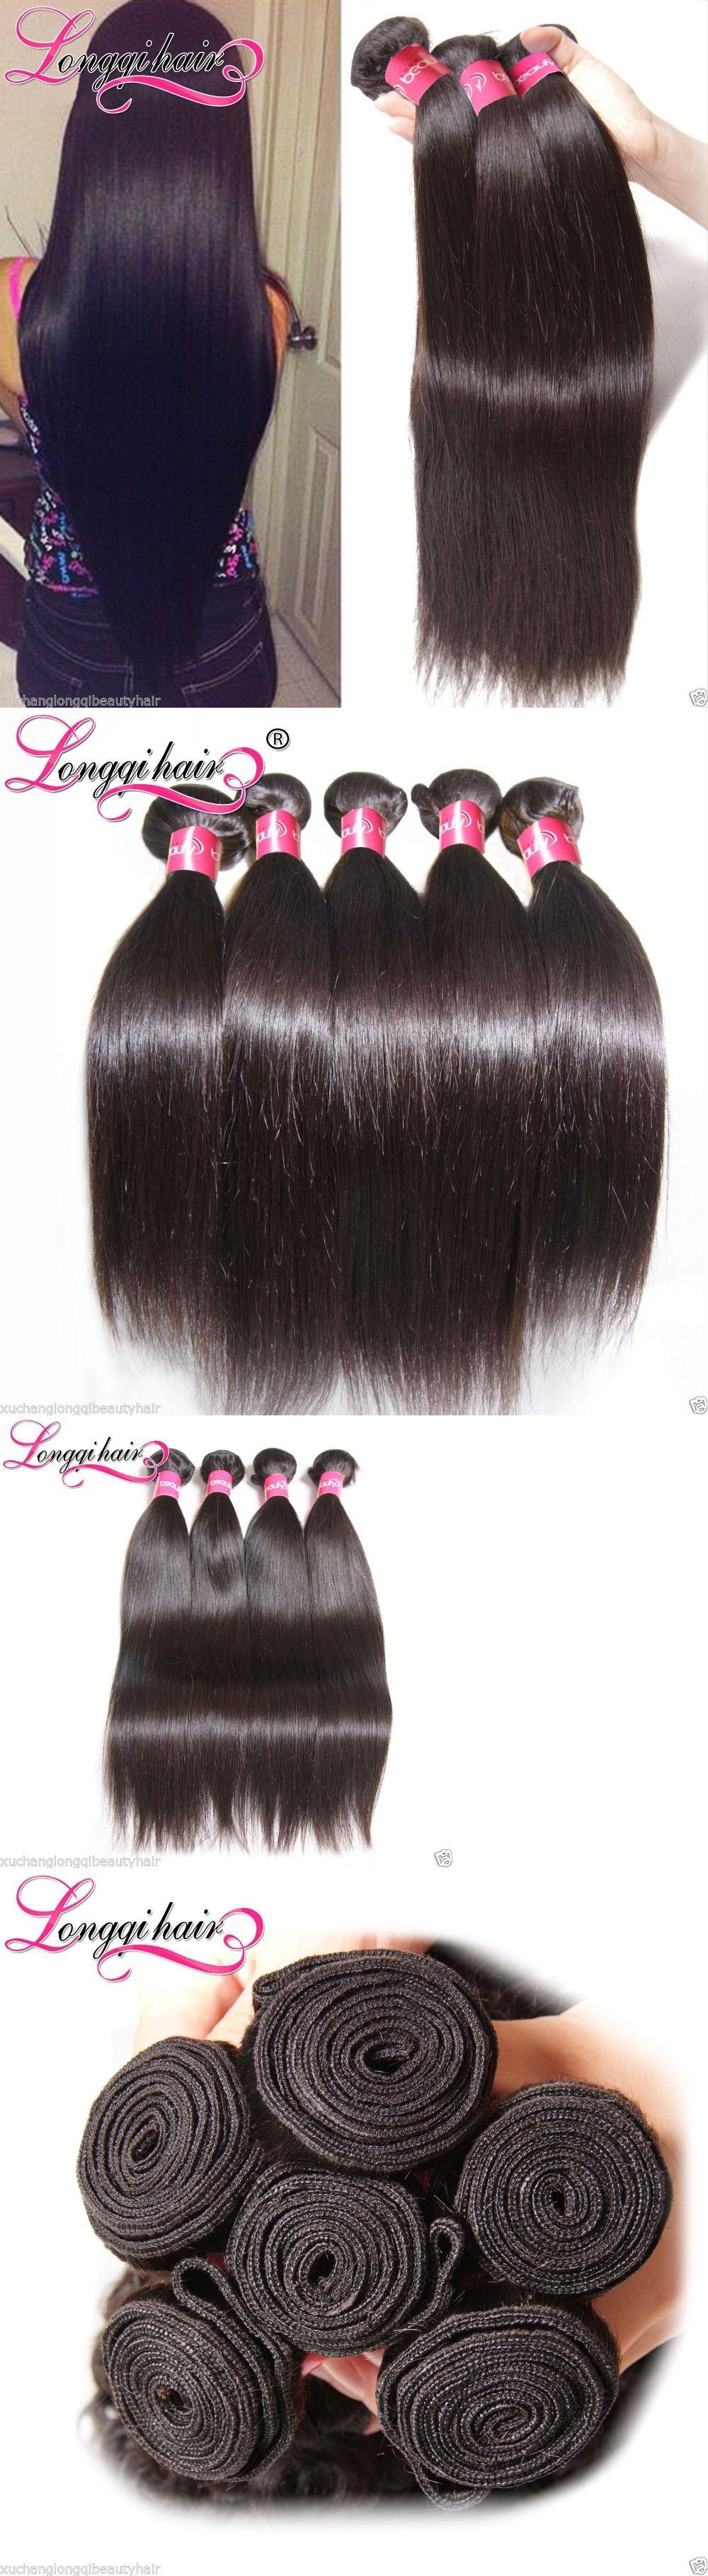 Hair Extensions 300g Peruvian Hair 3 Bundles 100 Peruvian Straight